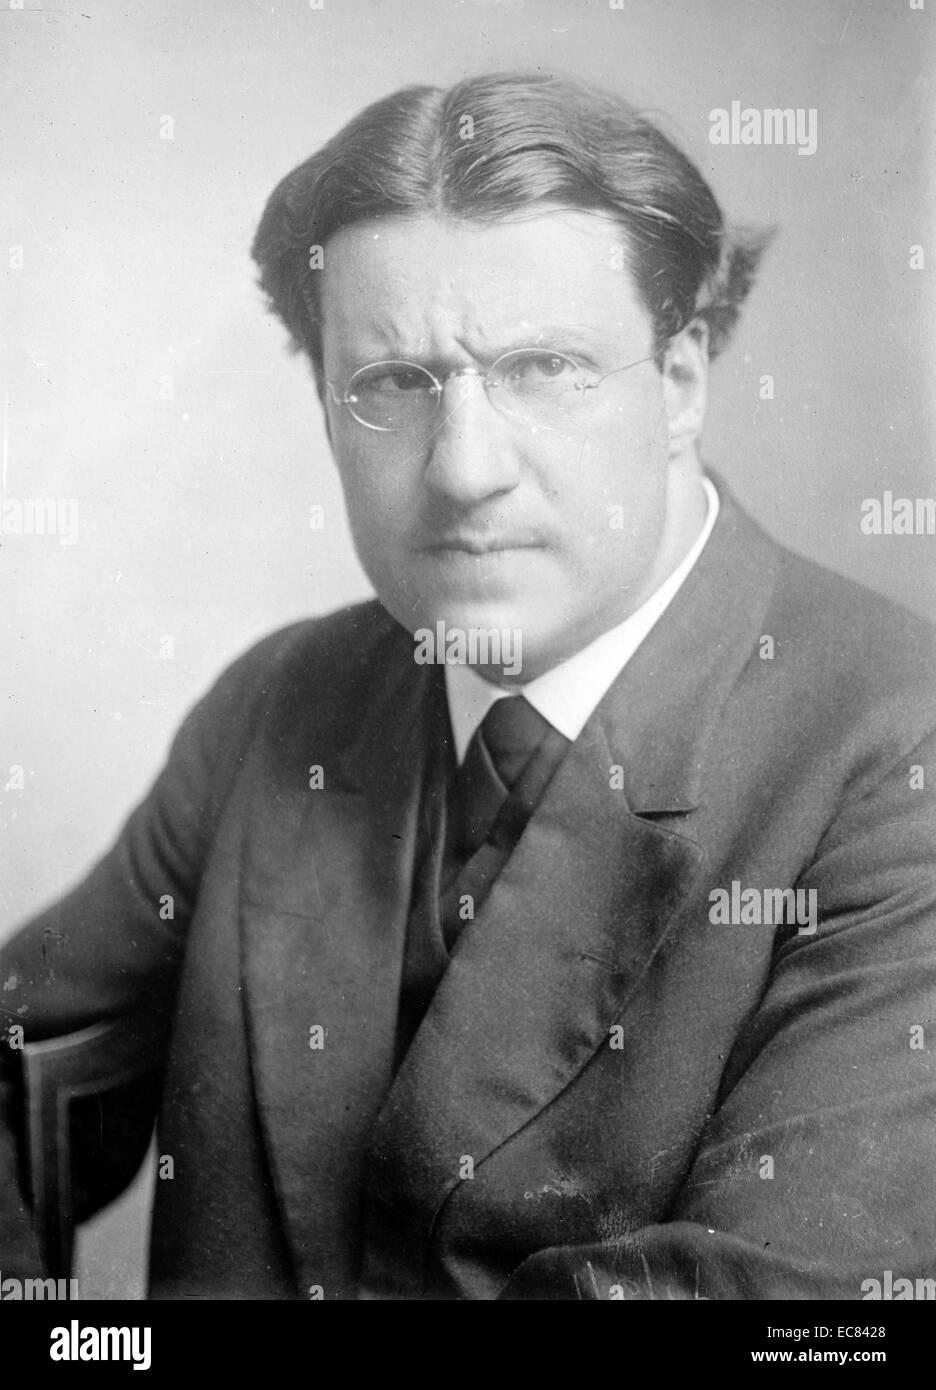 Photograph of Rabbi Stephen Samuel Wise - Stock Image